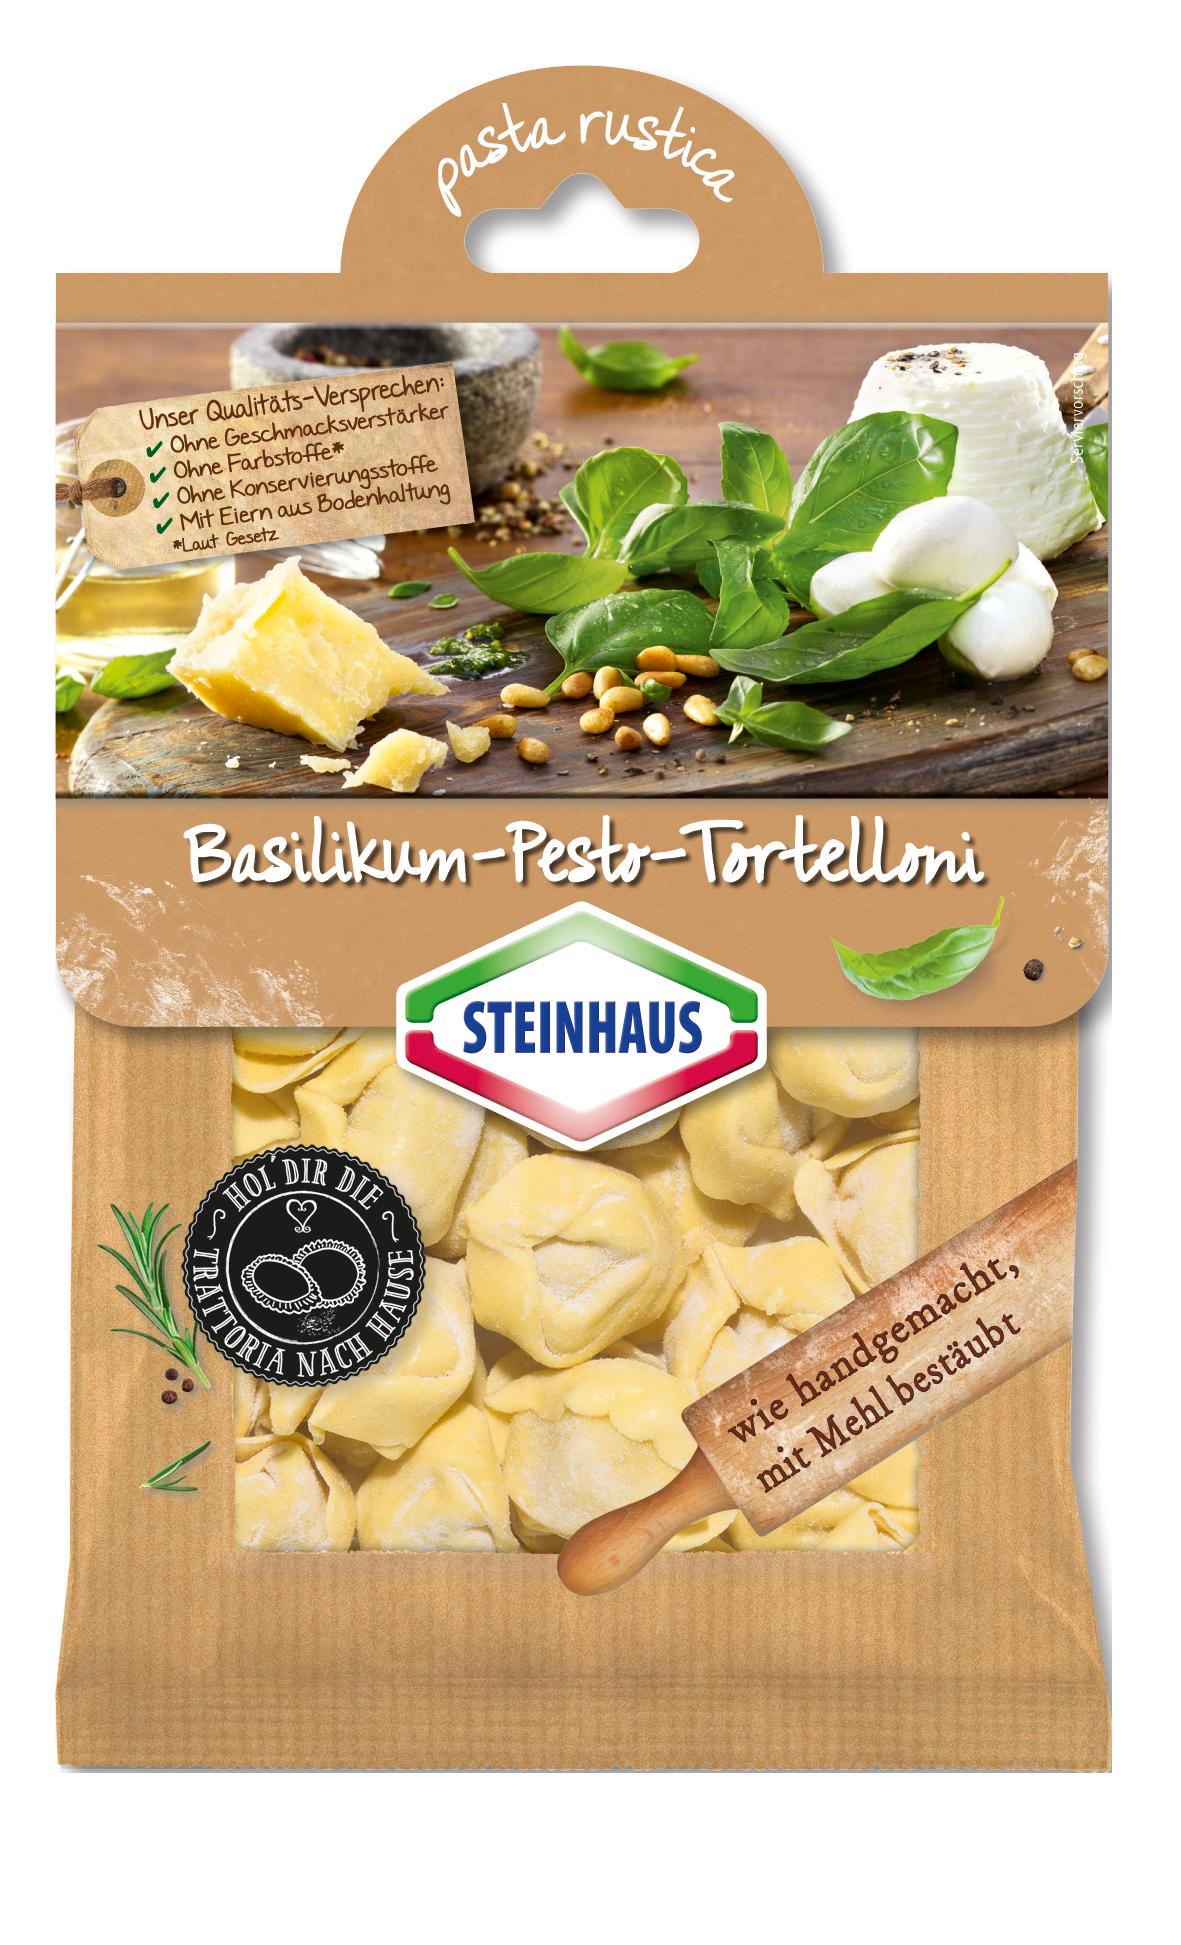 Basilikum-Pesto-Tortelloni